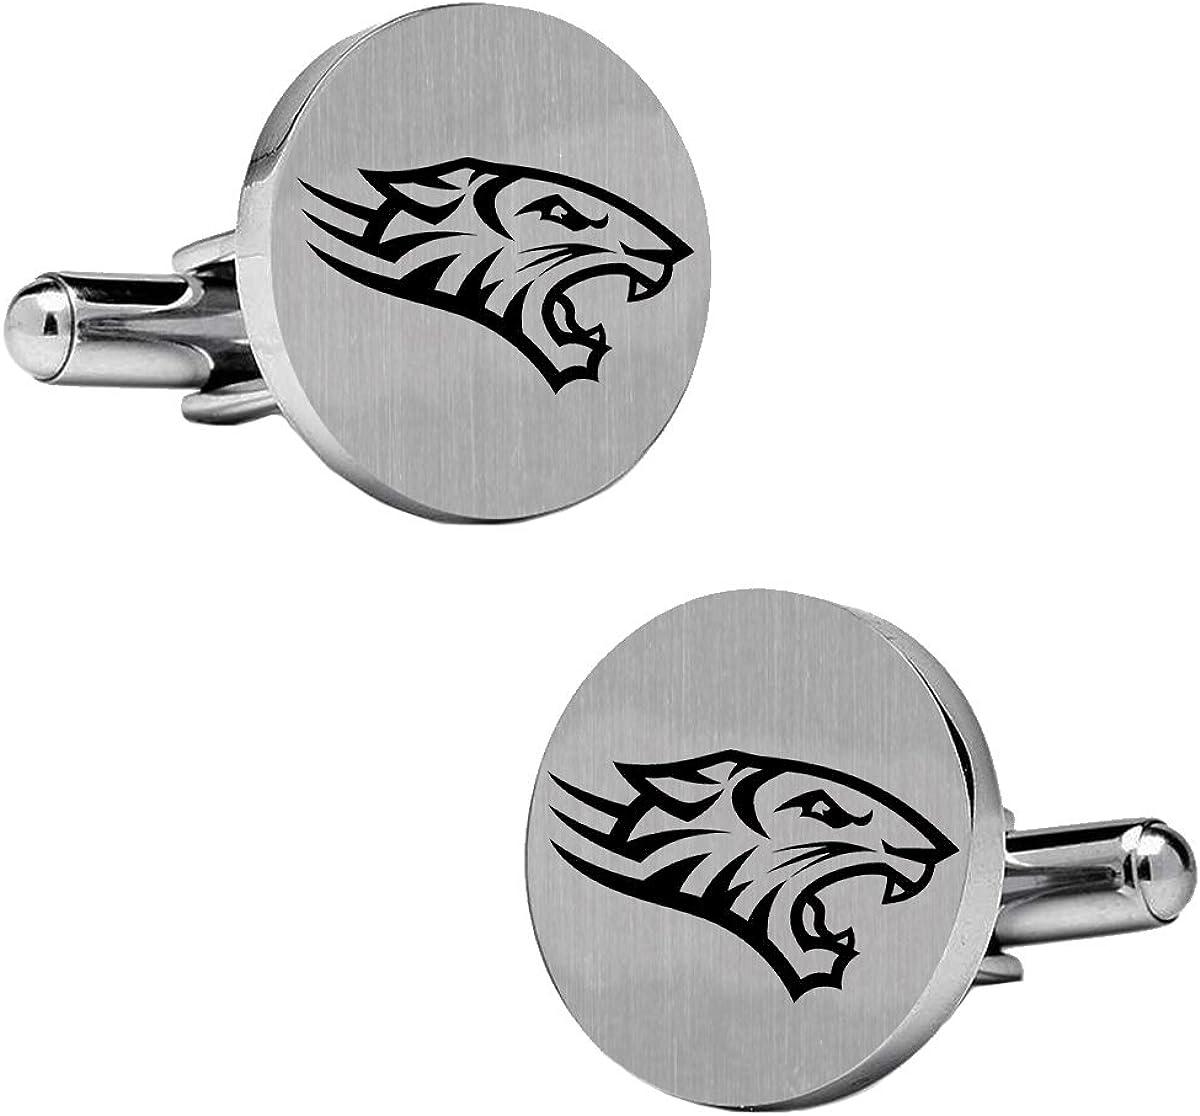 College Jewelry Towson Tigers Stainless Steel Round Cufflinks